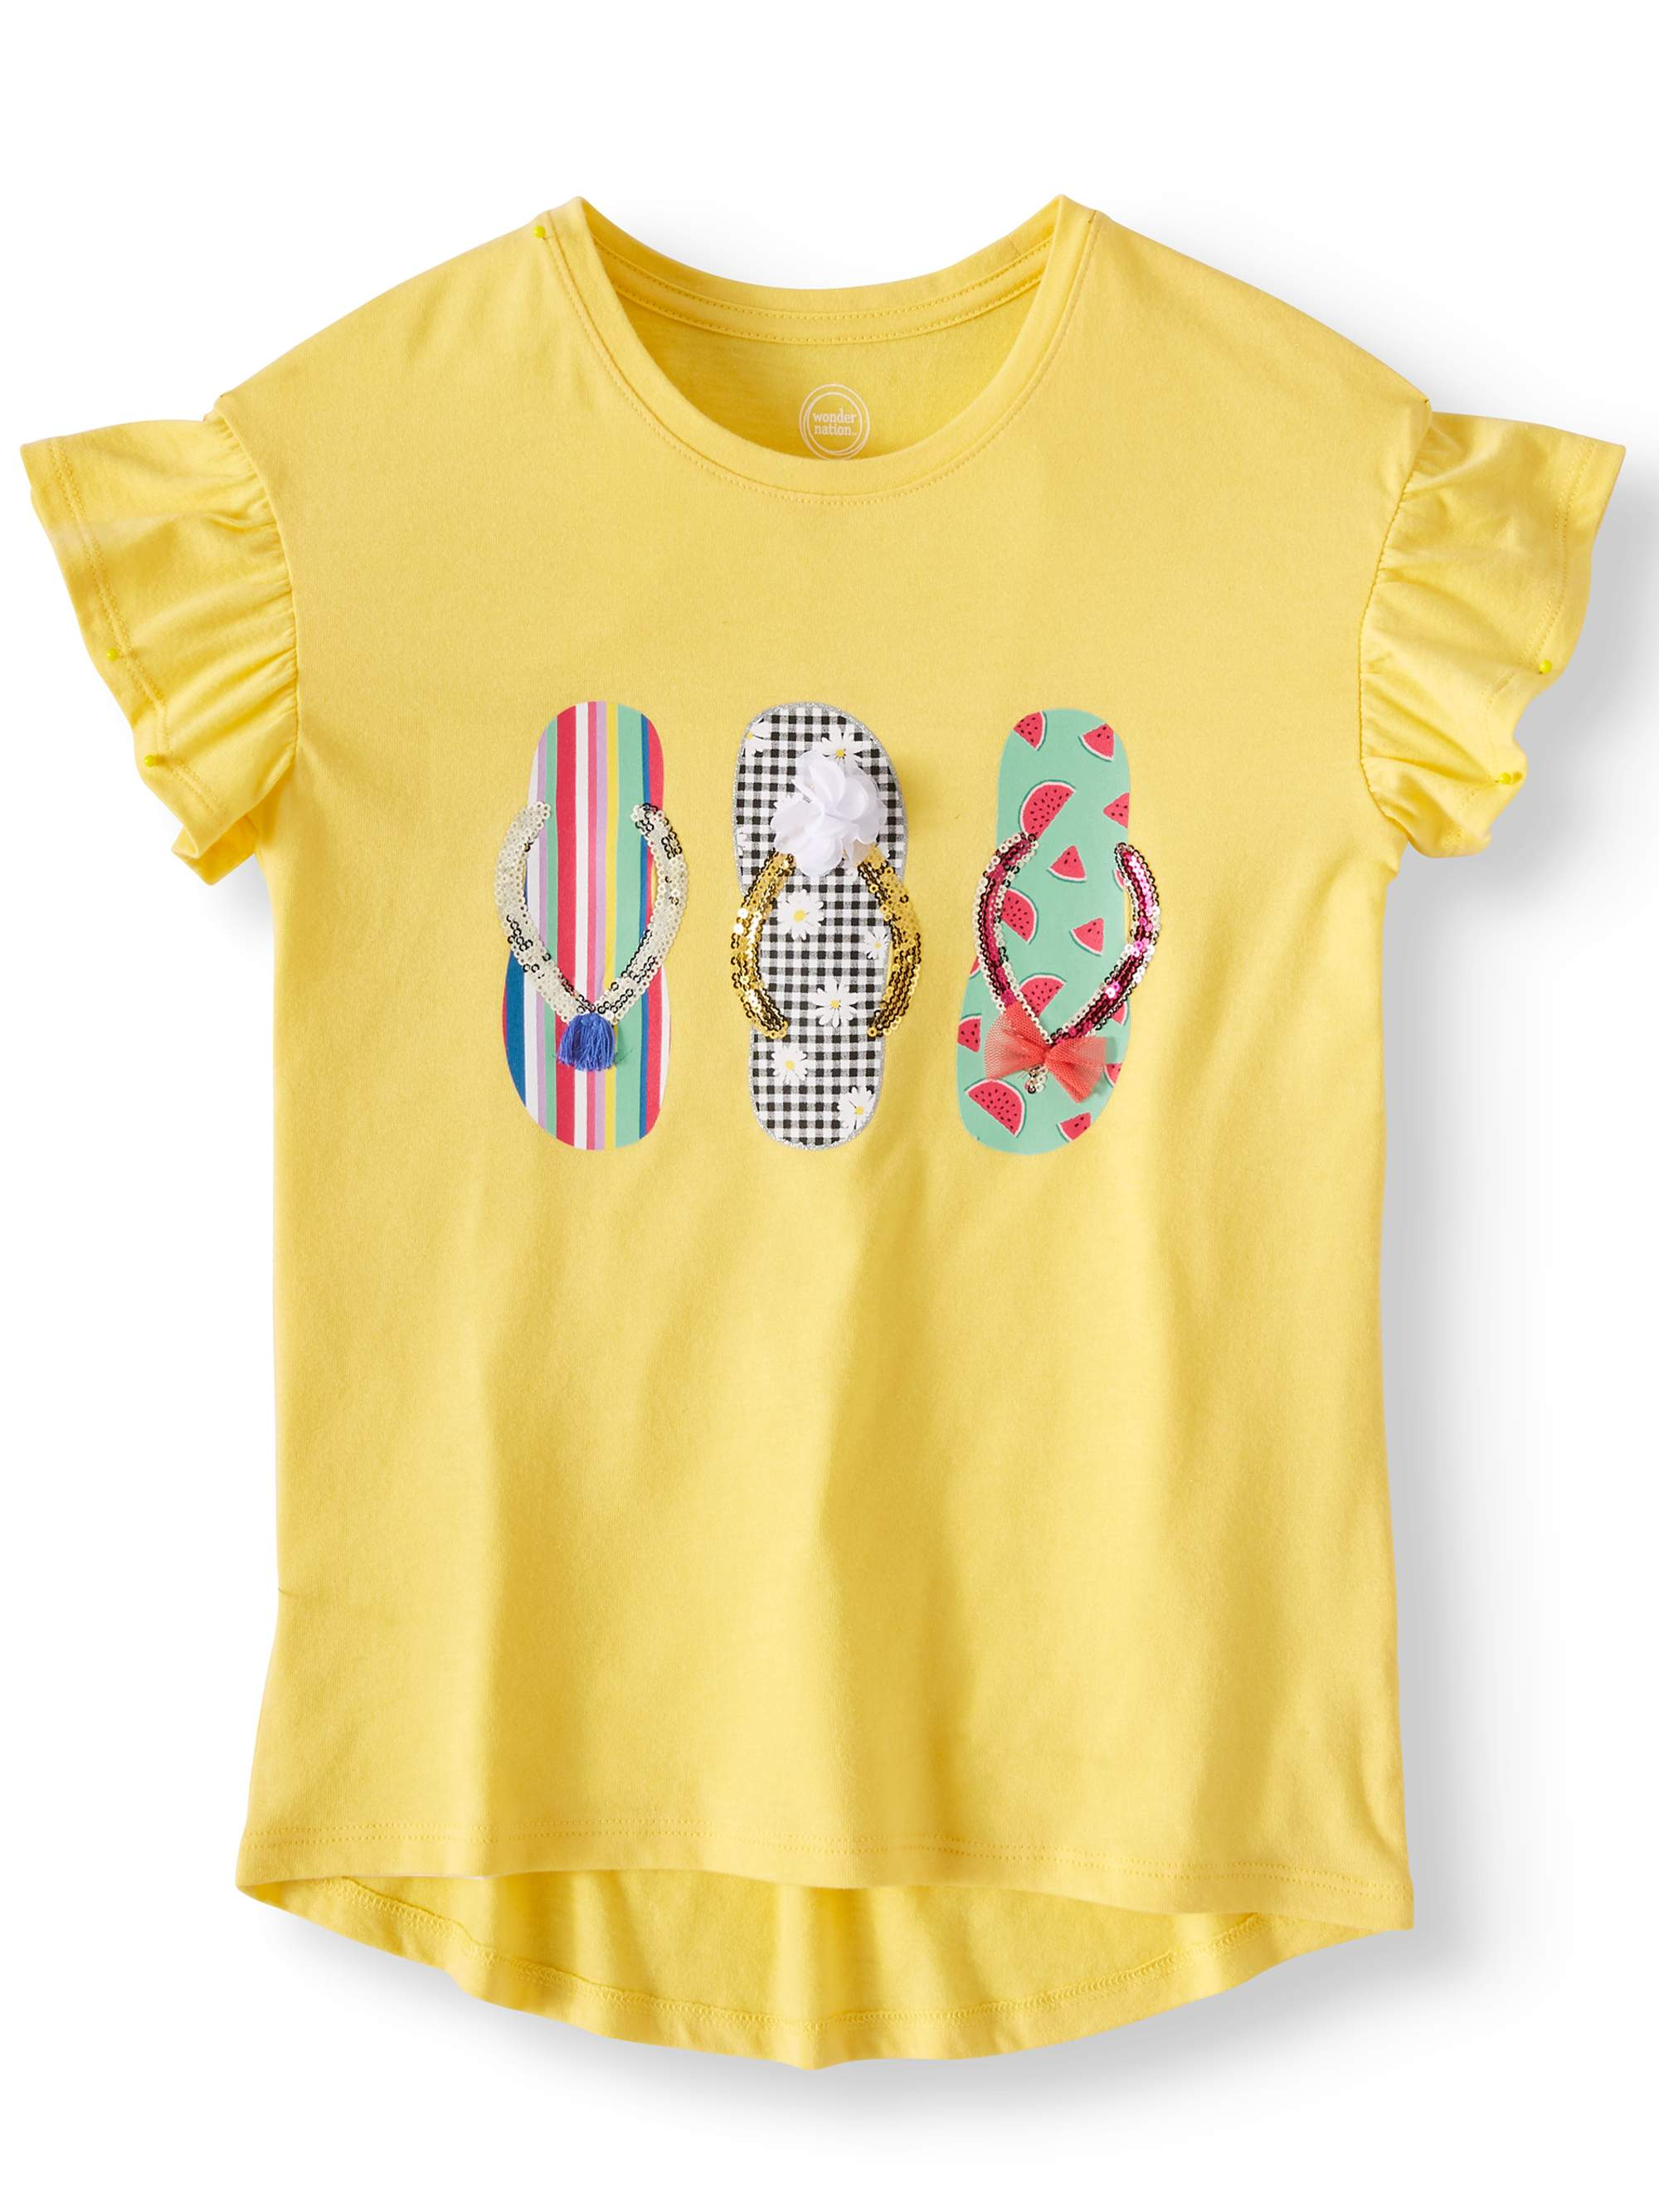 Short Sleeve Embellished Tee (Little Girls, Big Girls, & Plus)